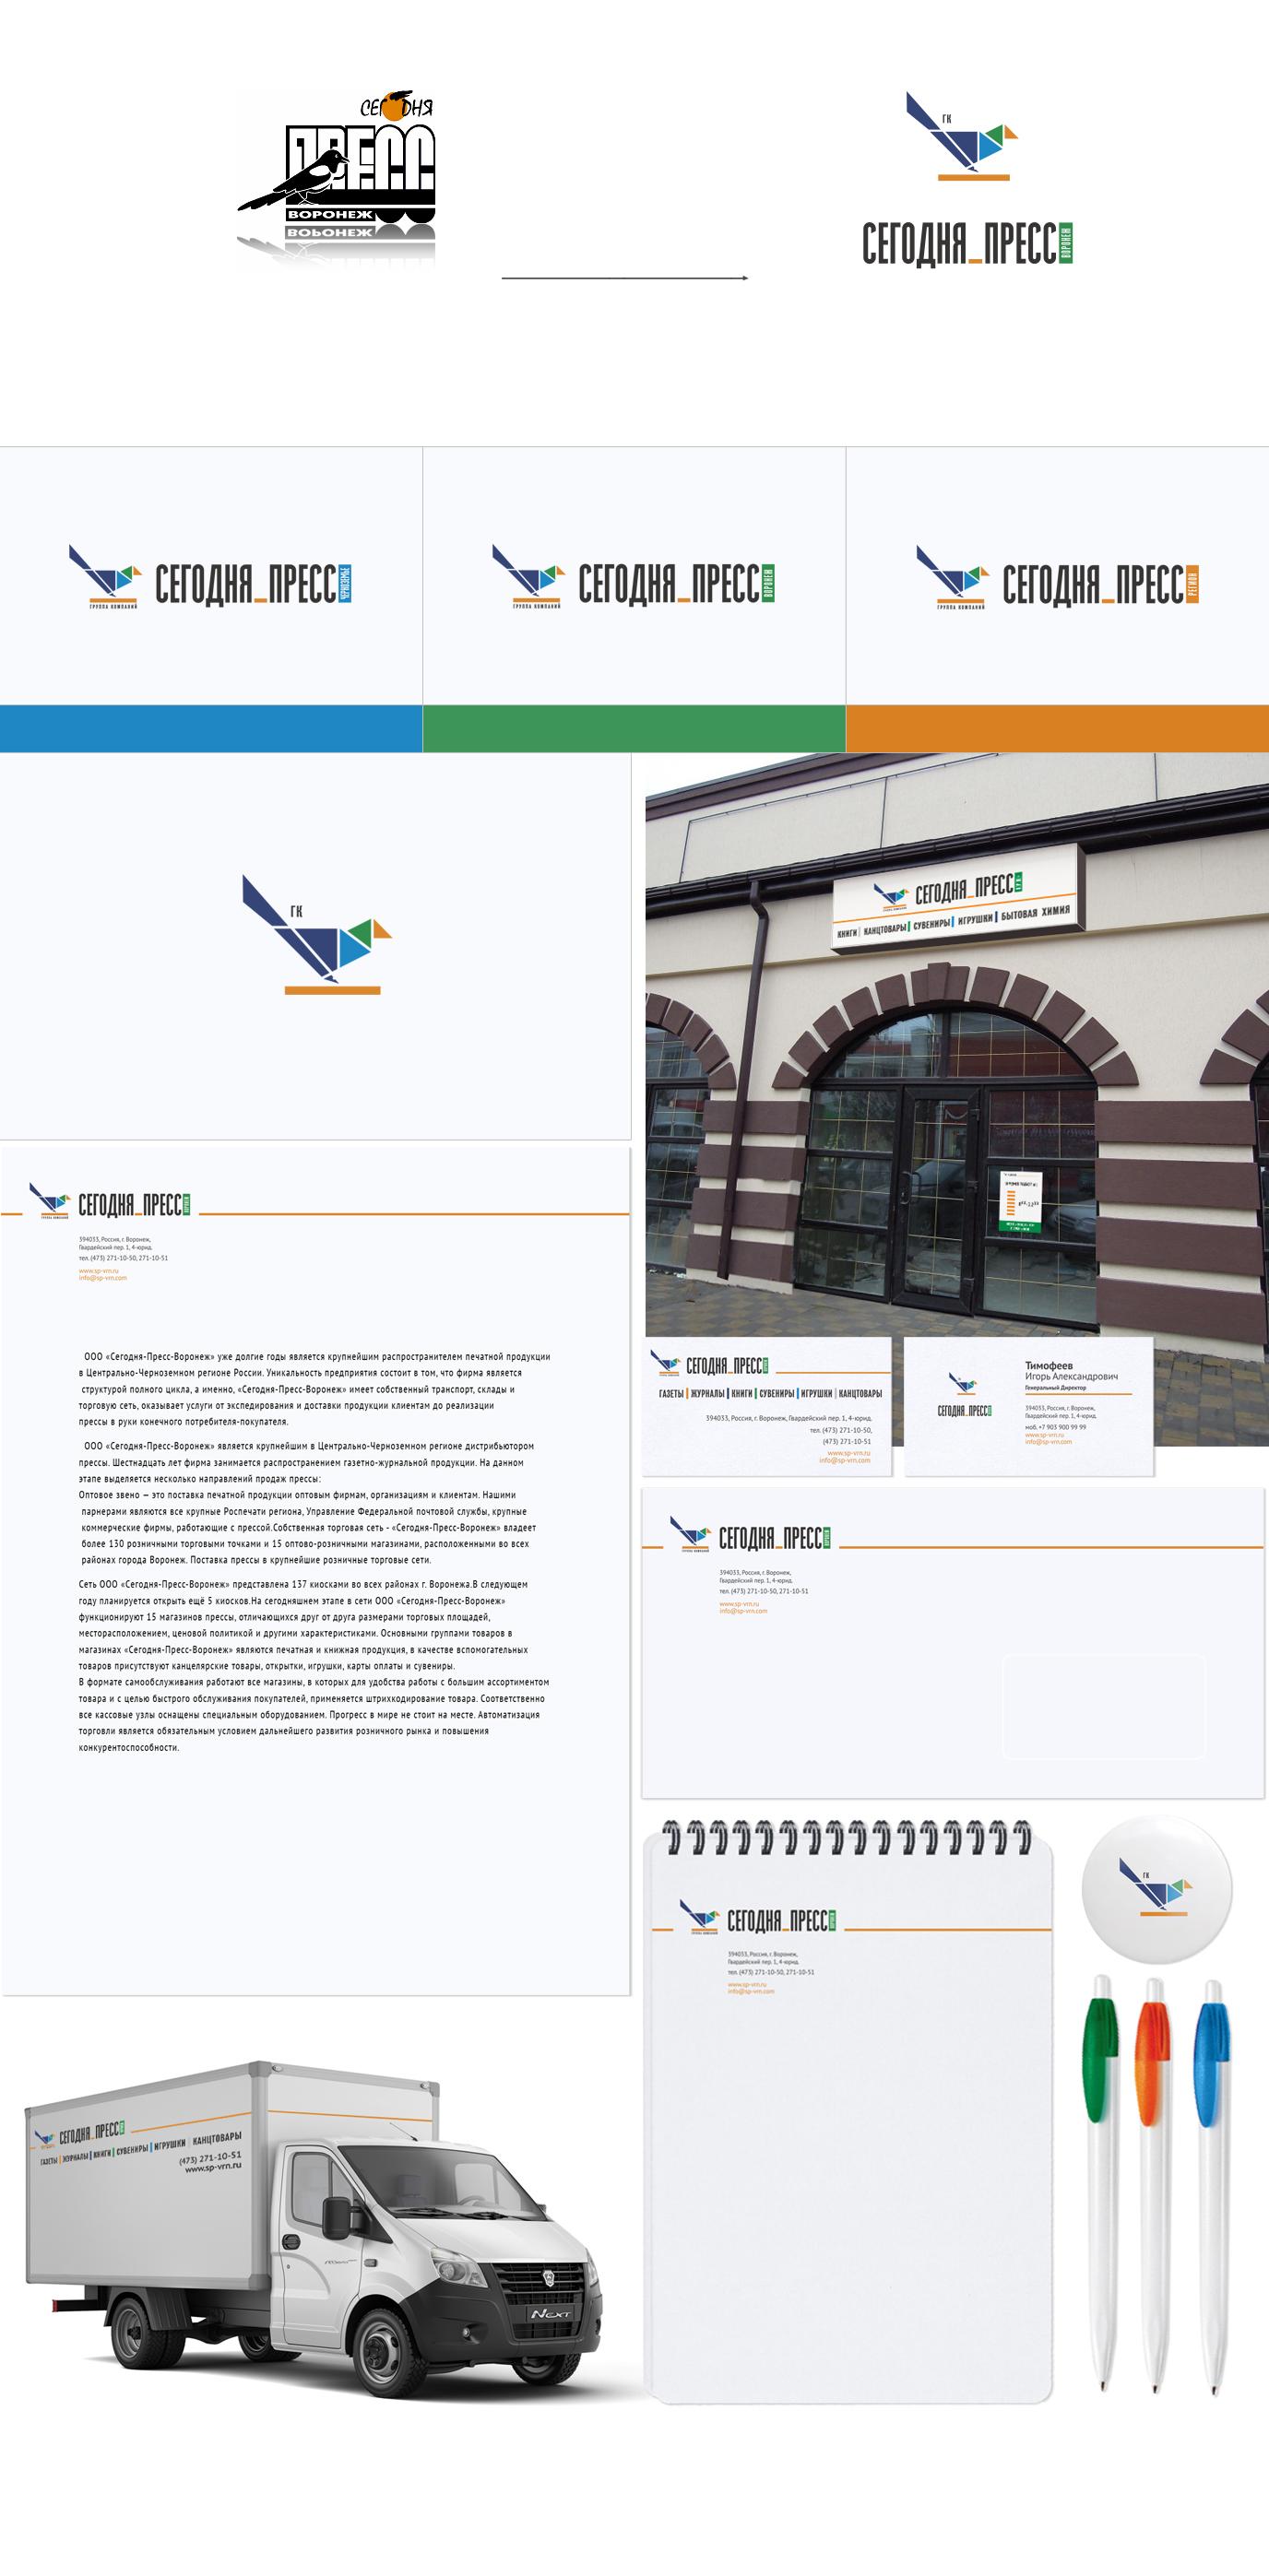 http://id1.ru/wp-content/uploads/2015/09/segodnya-press.jpg